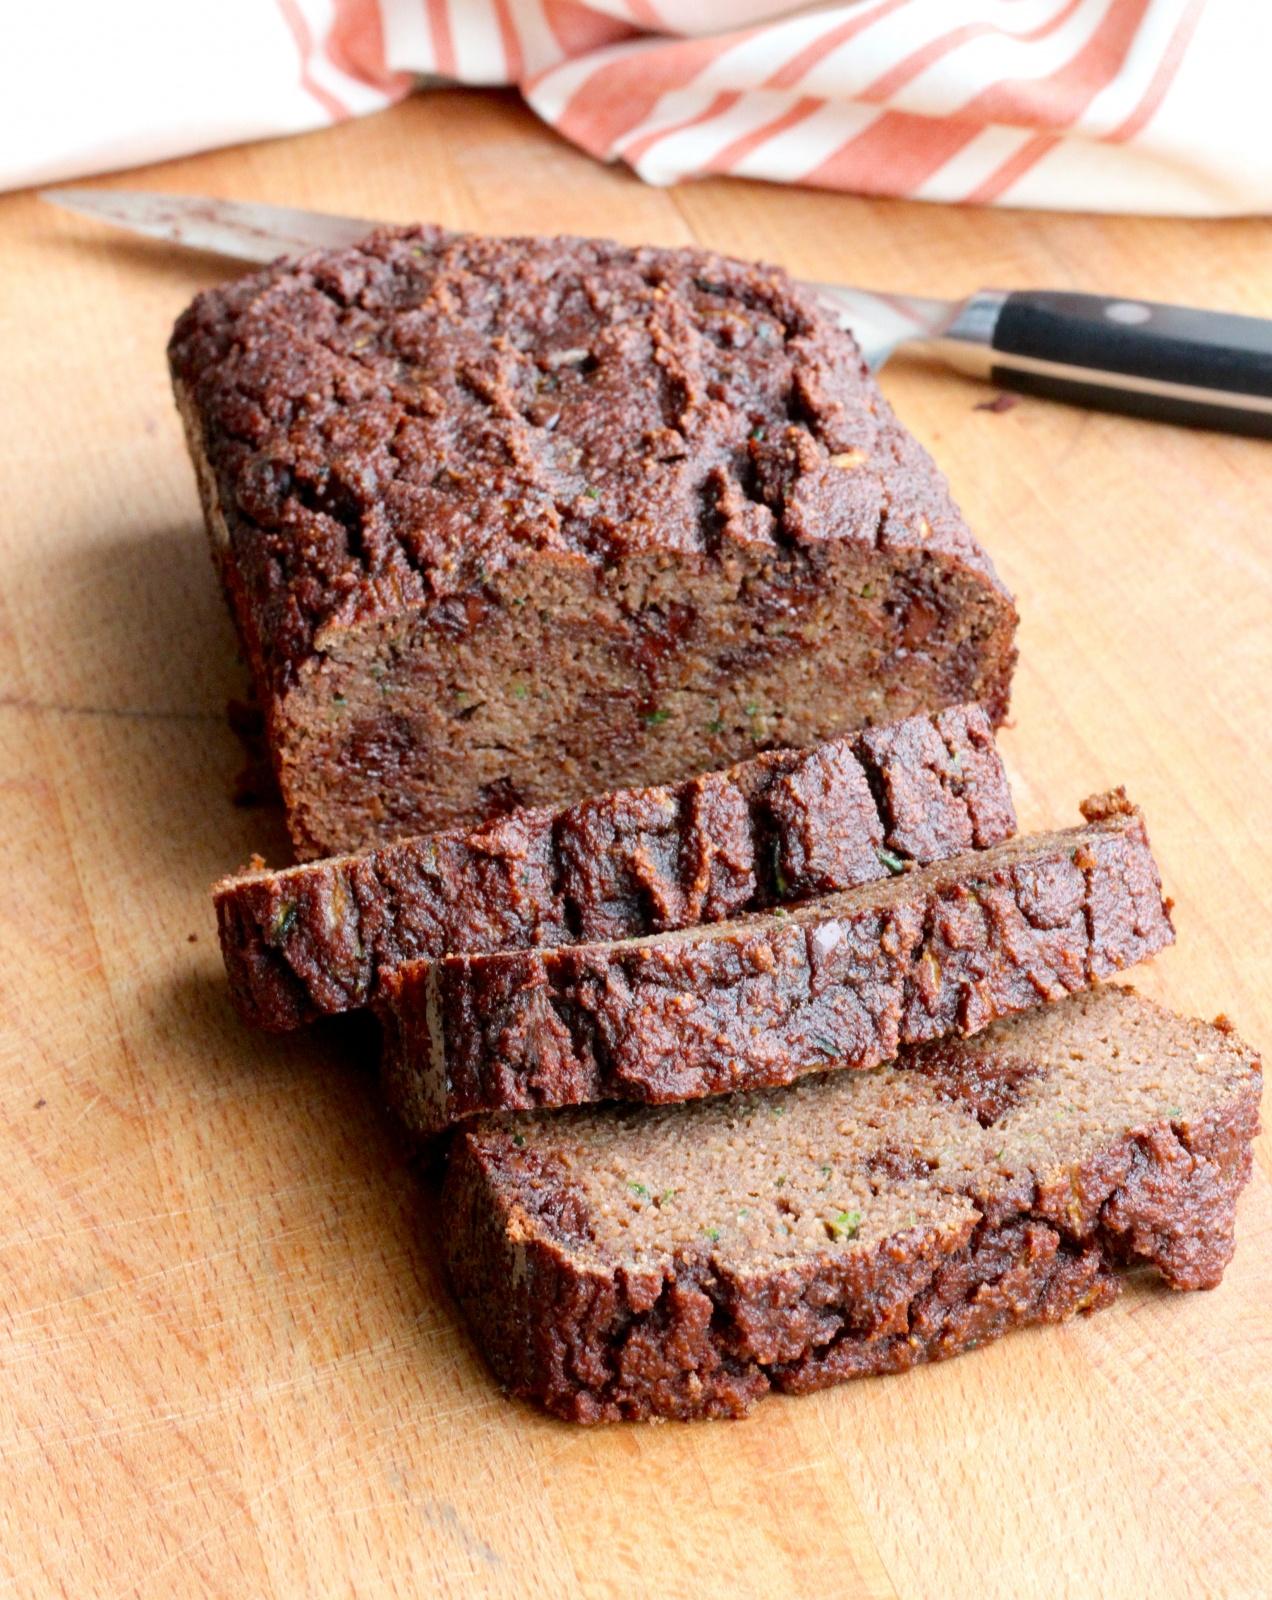 Almond Flour Chocolate Chip Zucchini Bread